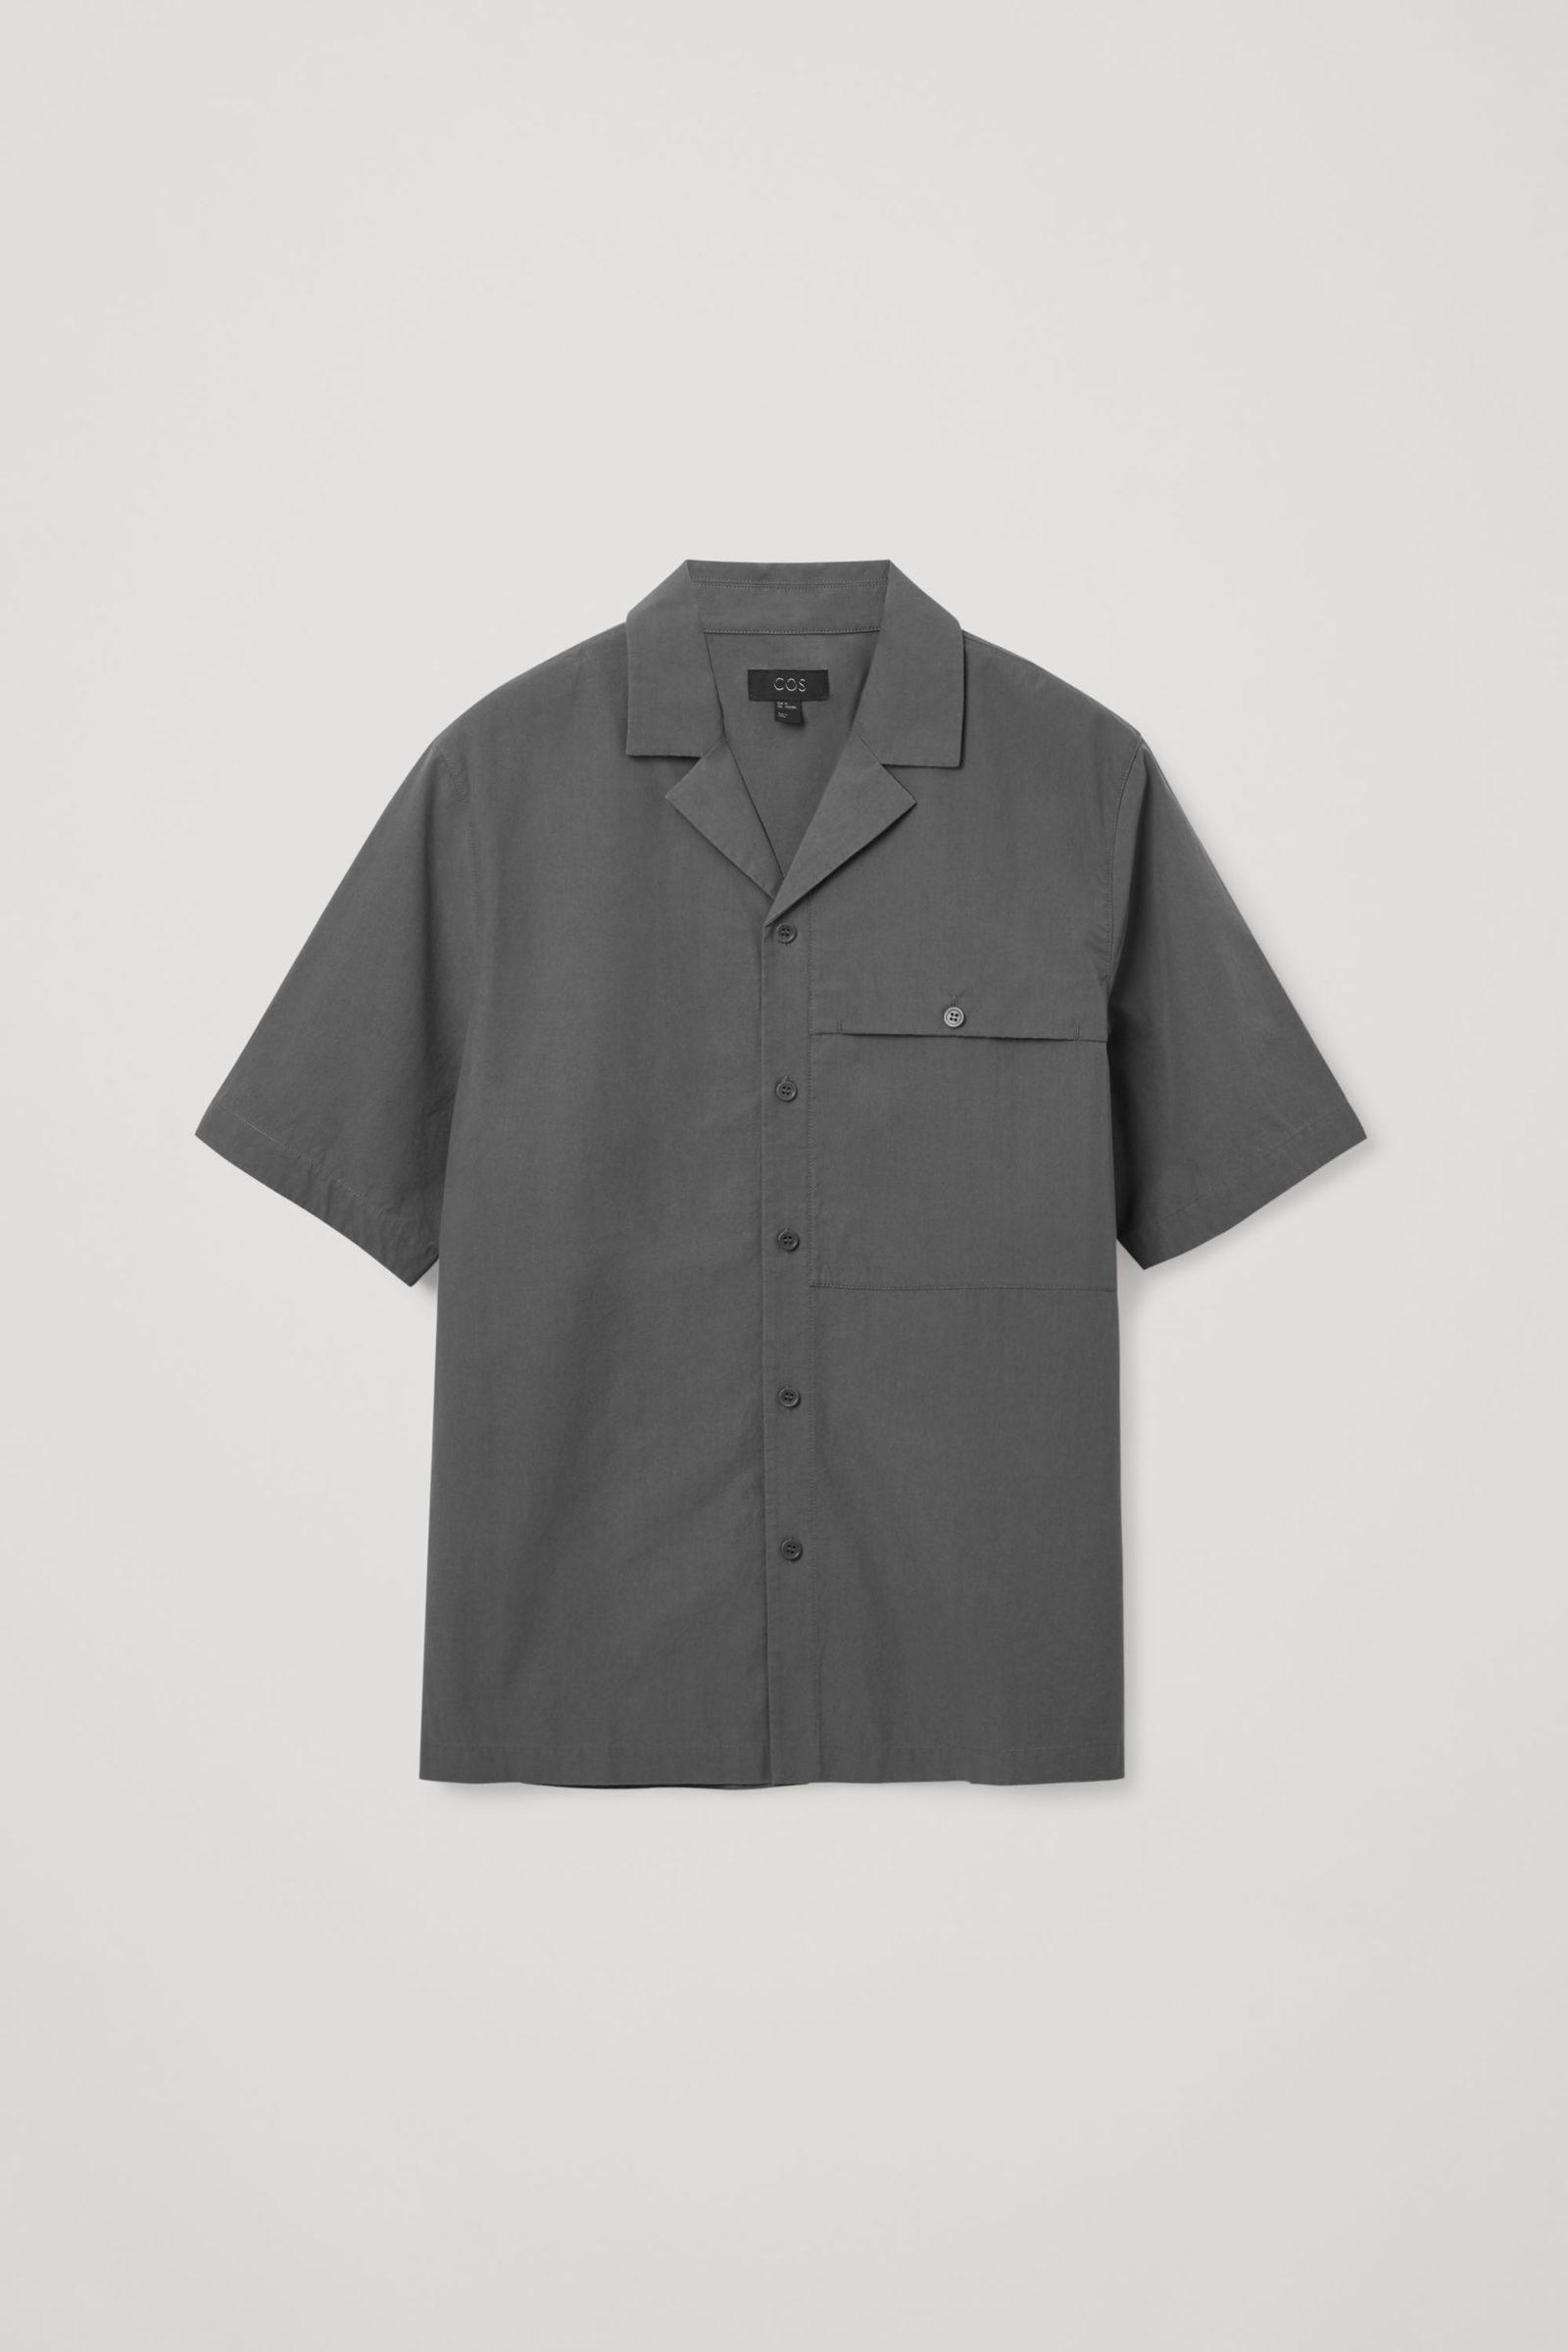 COS 패치 포켓 쇼트 슬리브 셔츠의 그레이컬러 Product입니다.